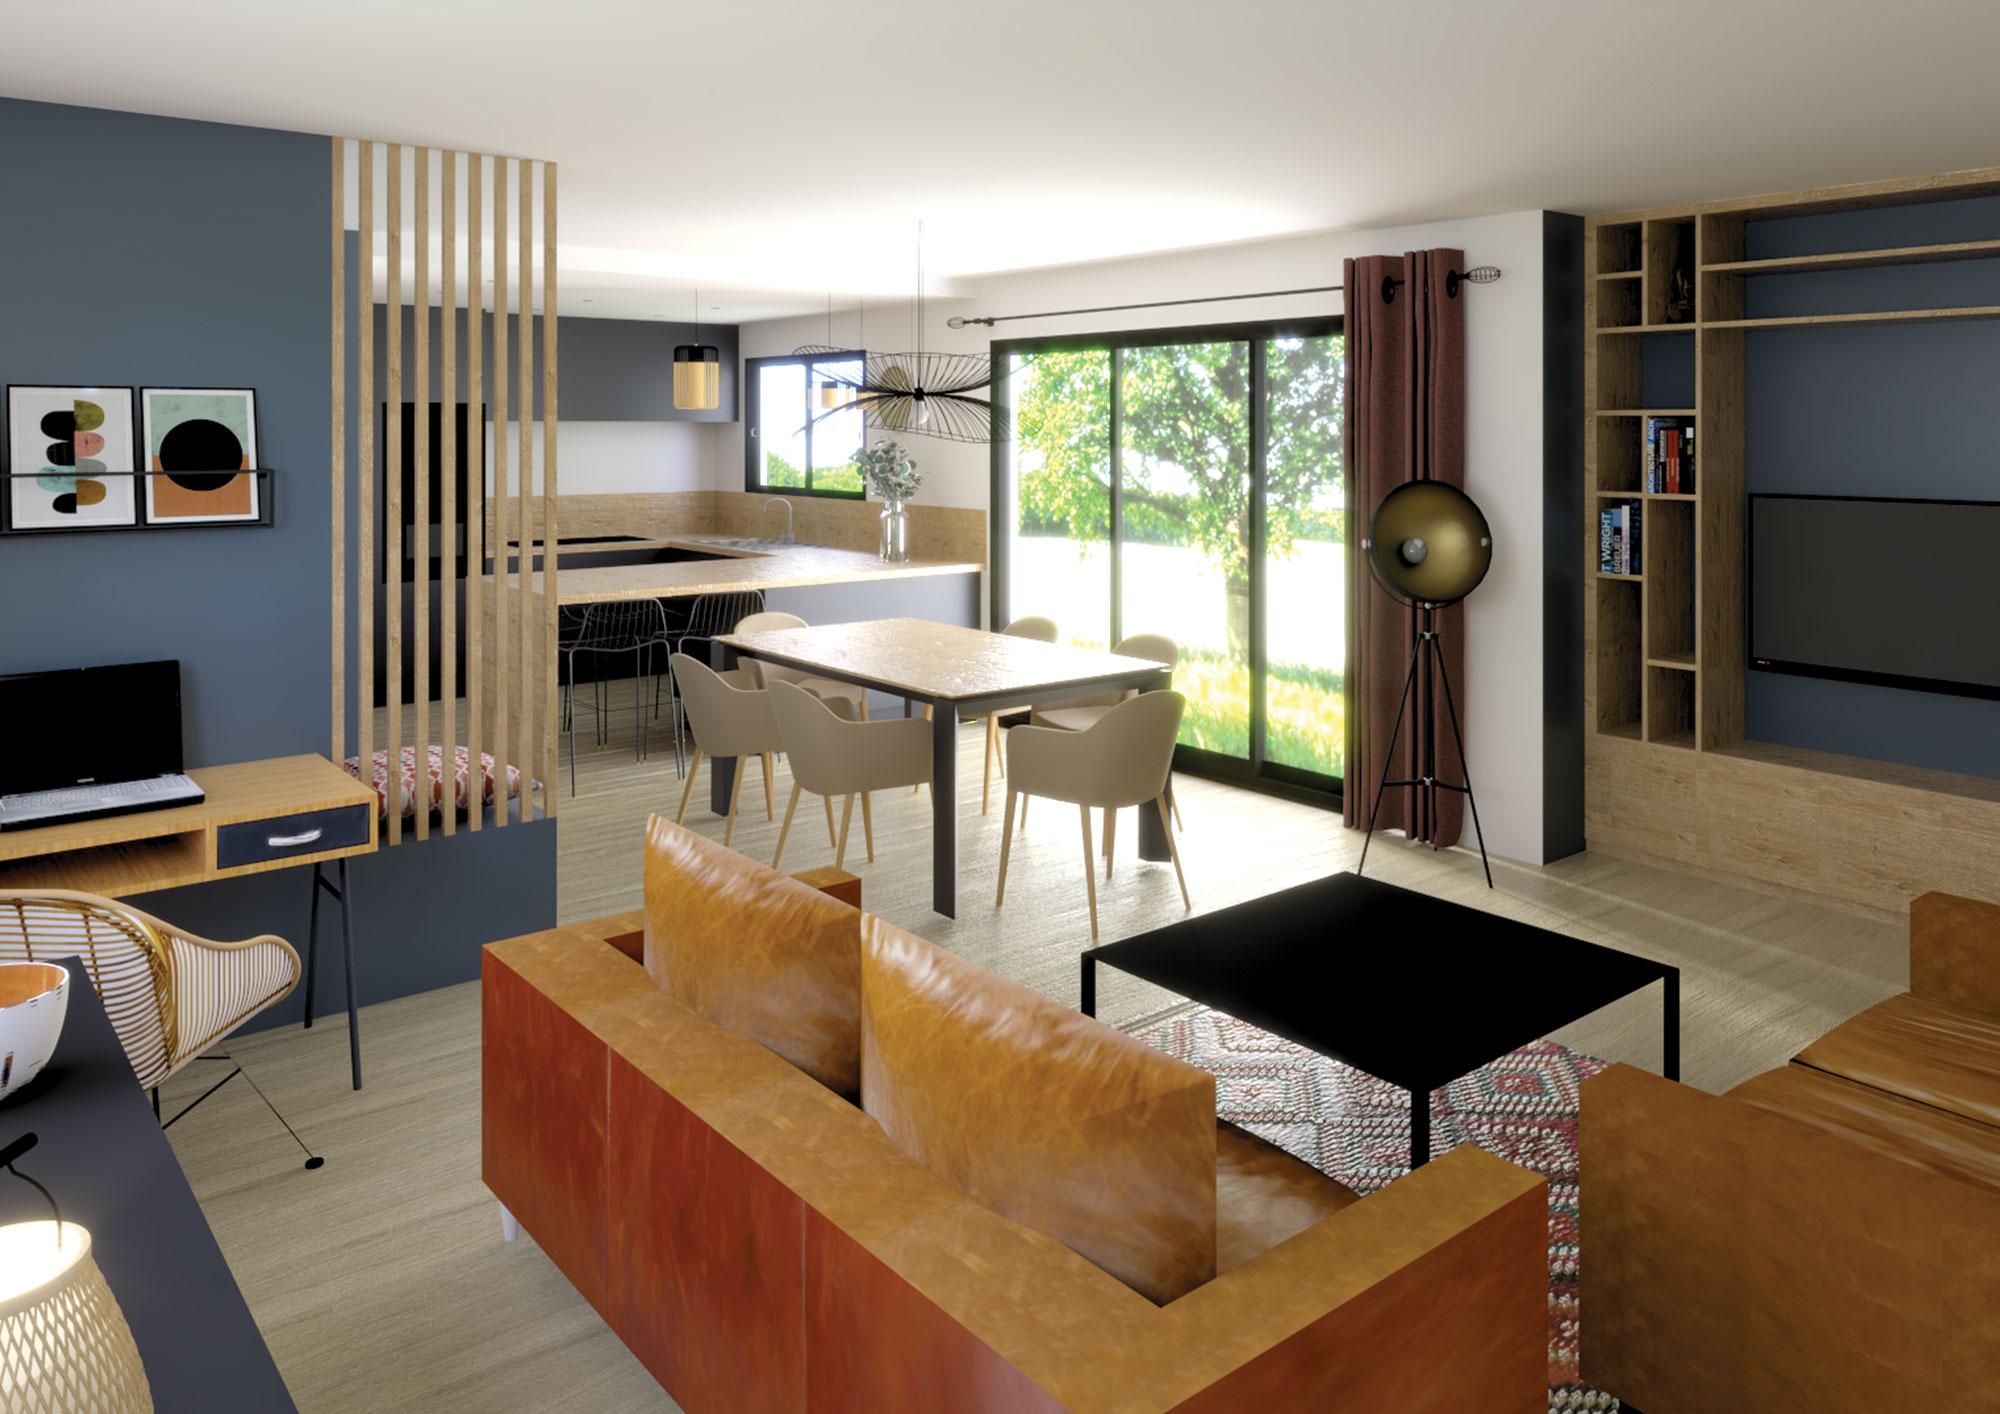 rendu-photo-realiste-piece-de-vie-maison-construction-montussan-gironde